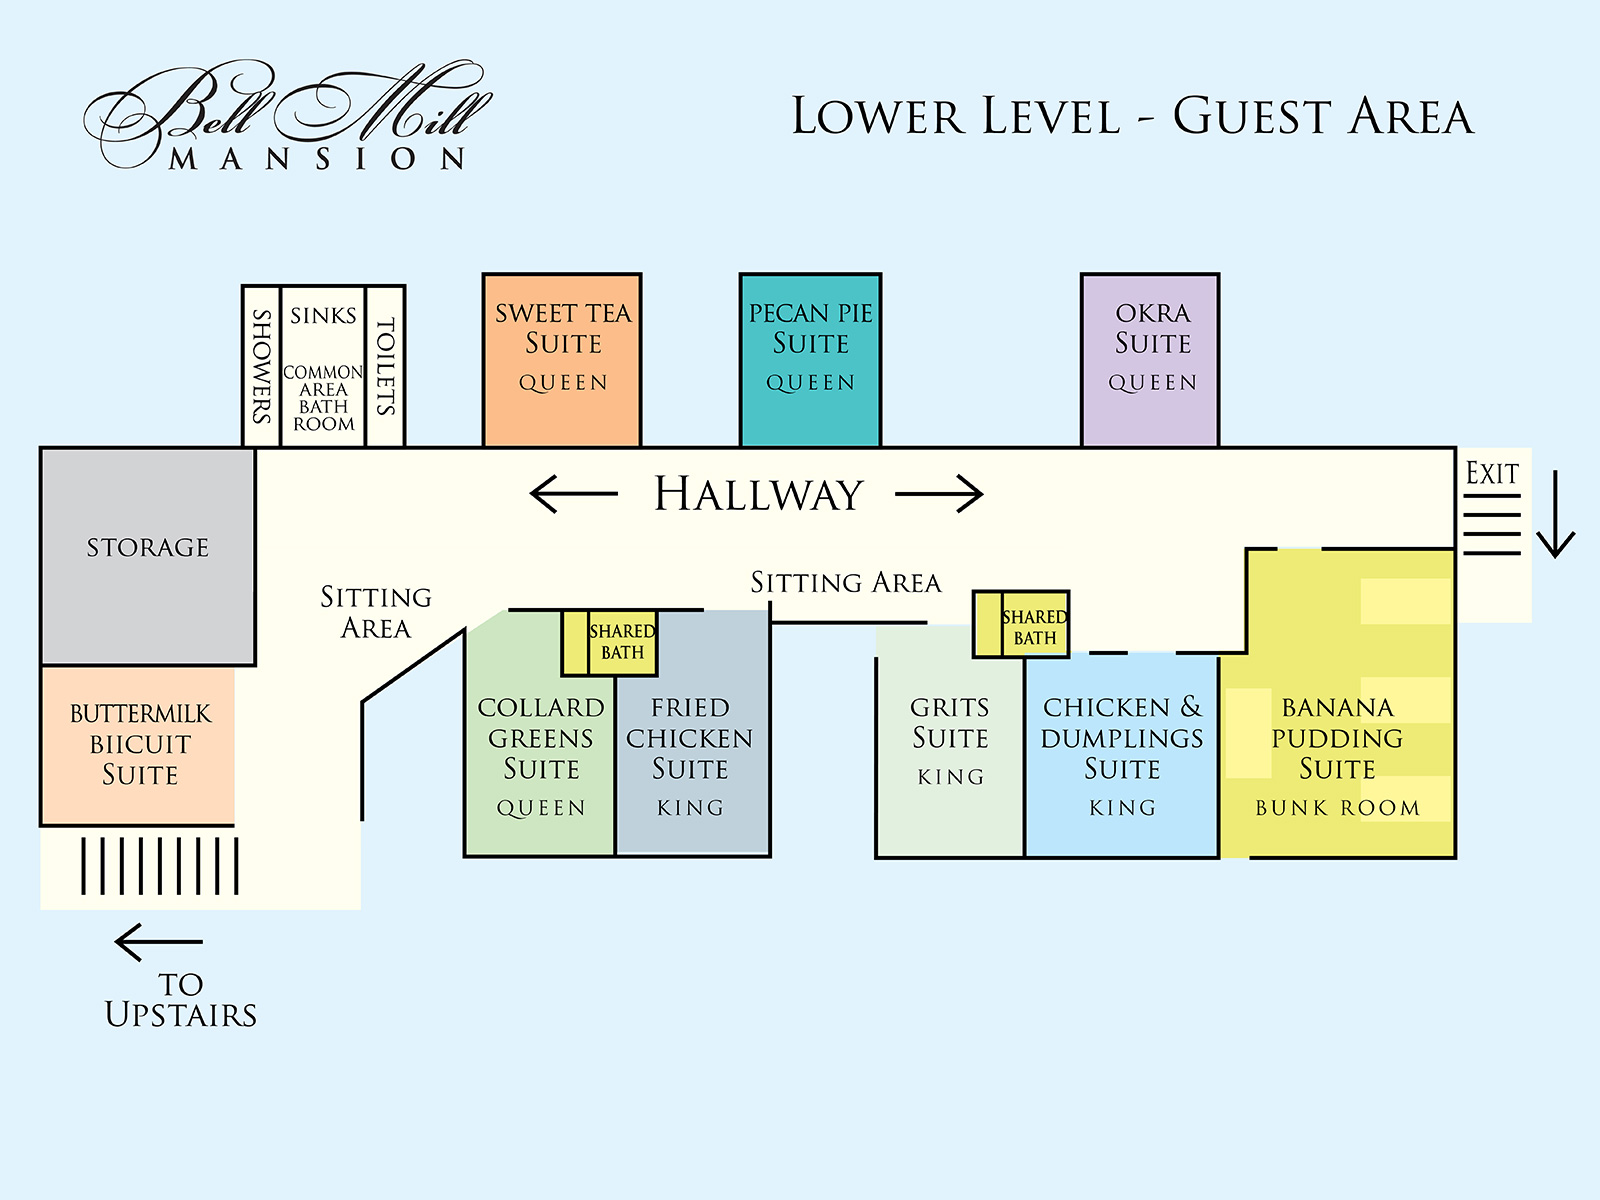 Bell Mill Mansion | Floor Plan - Lower Level